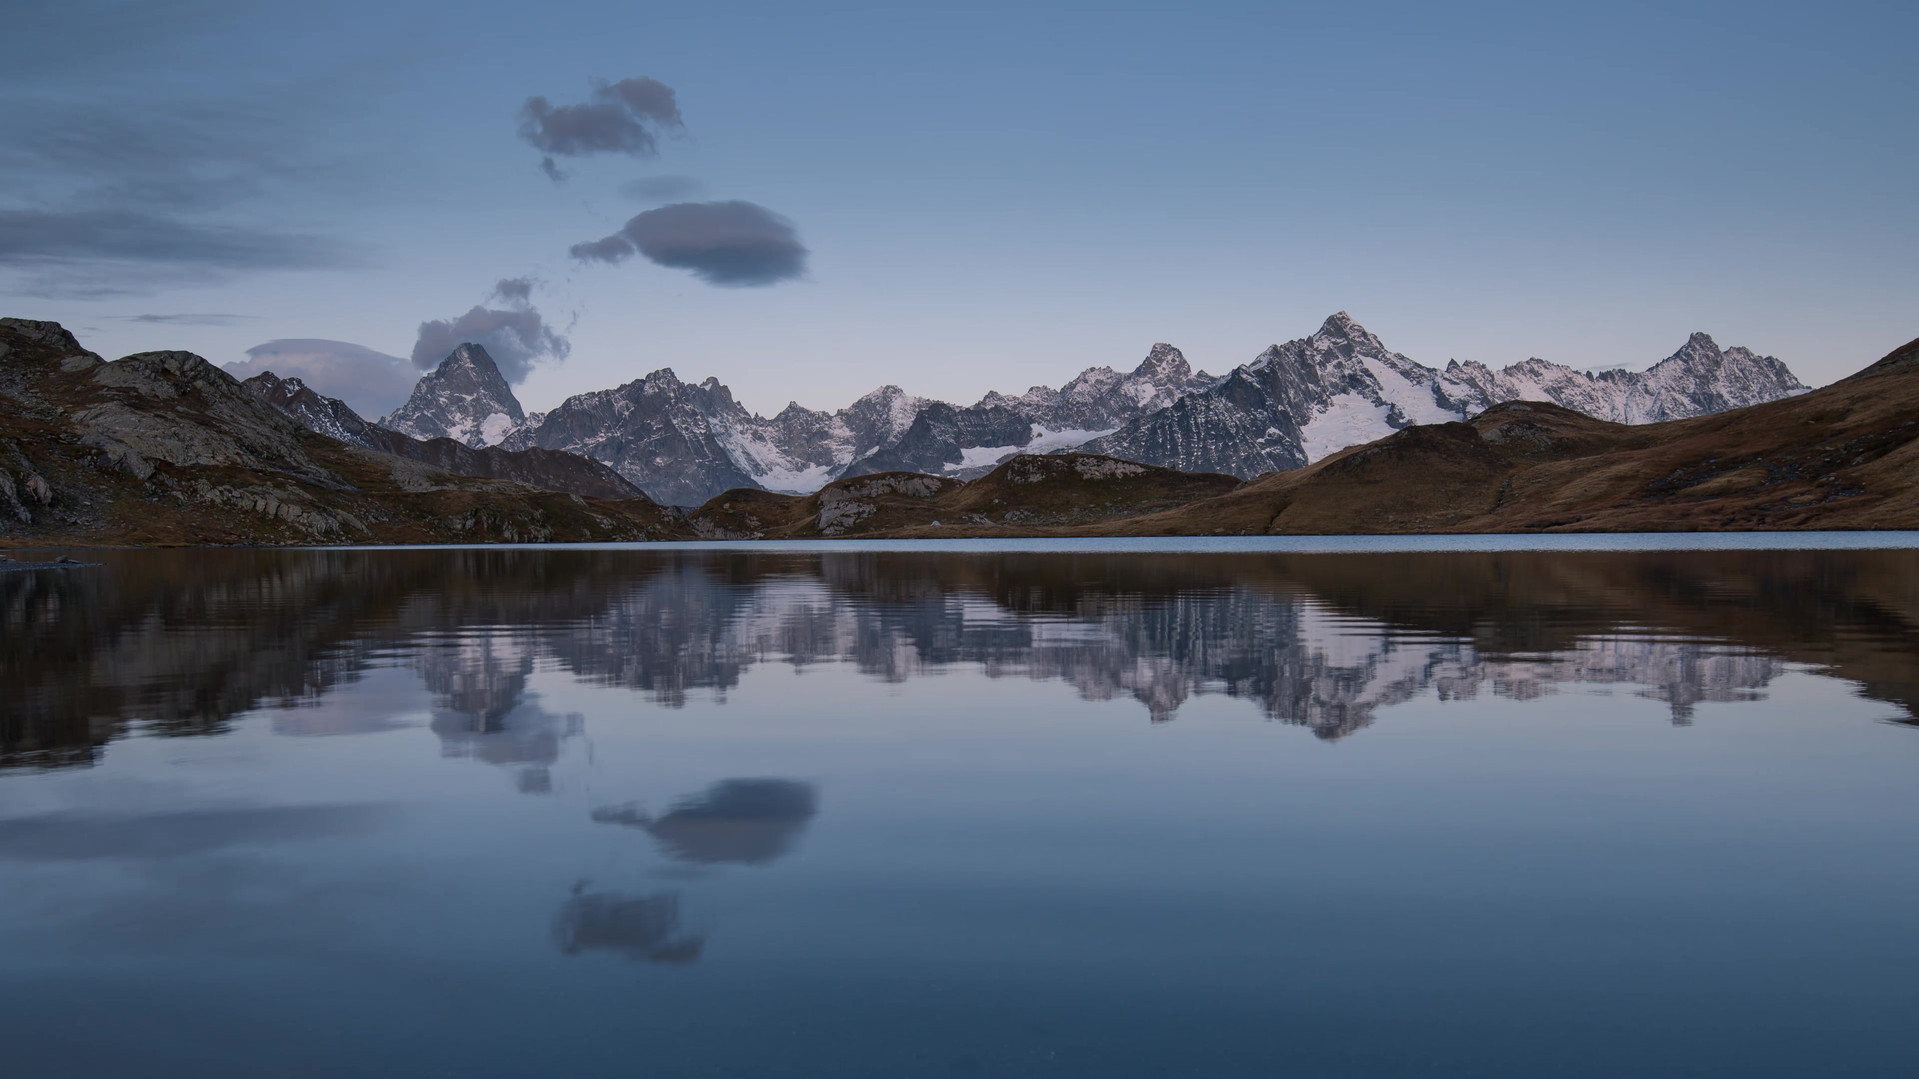 Time lapse alba laghi fenetre.mp4